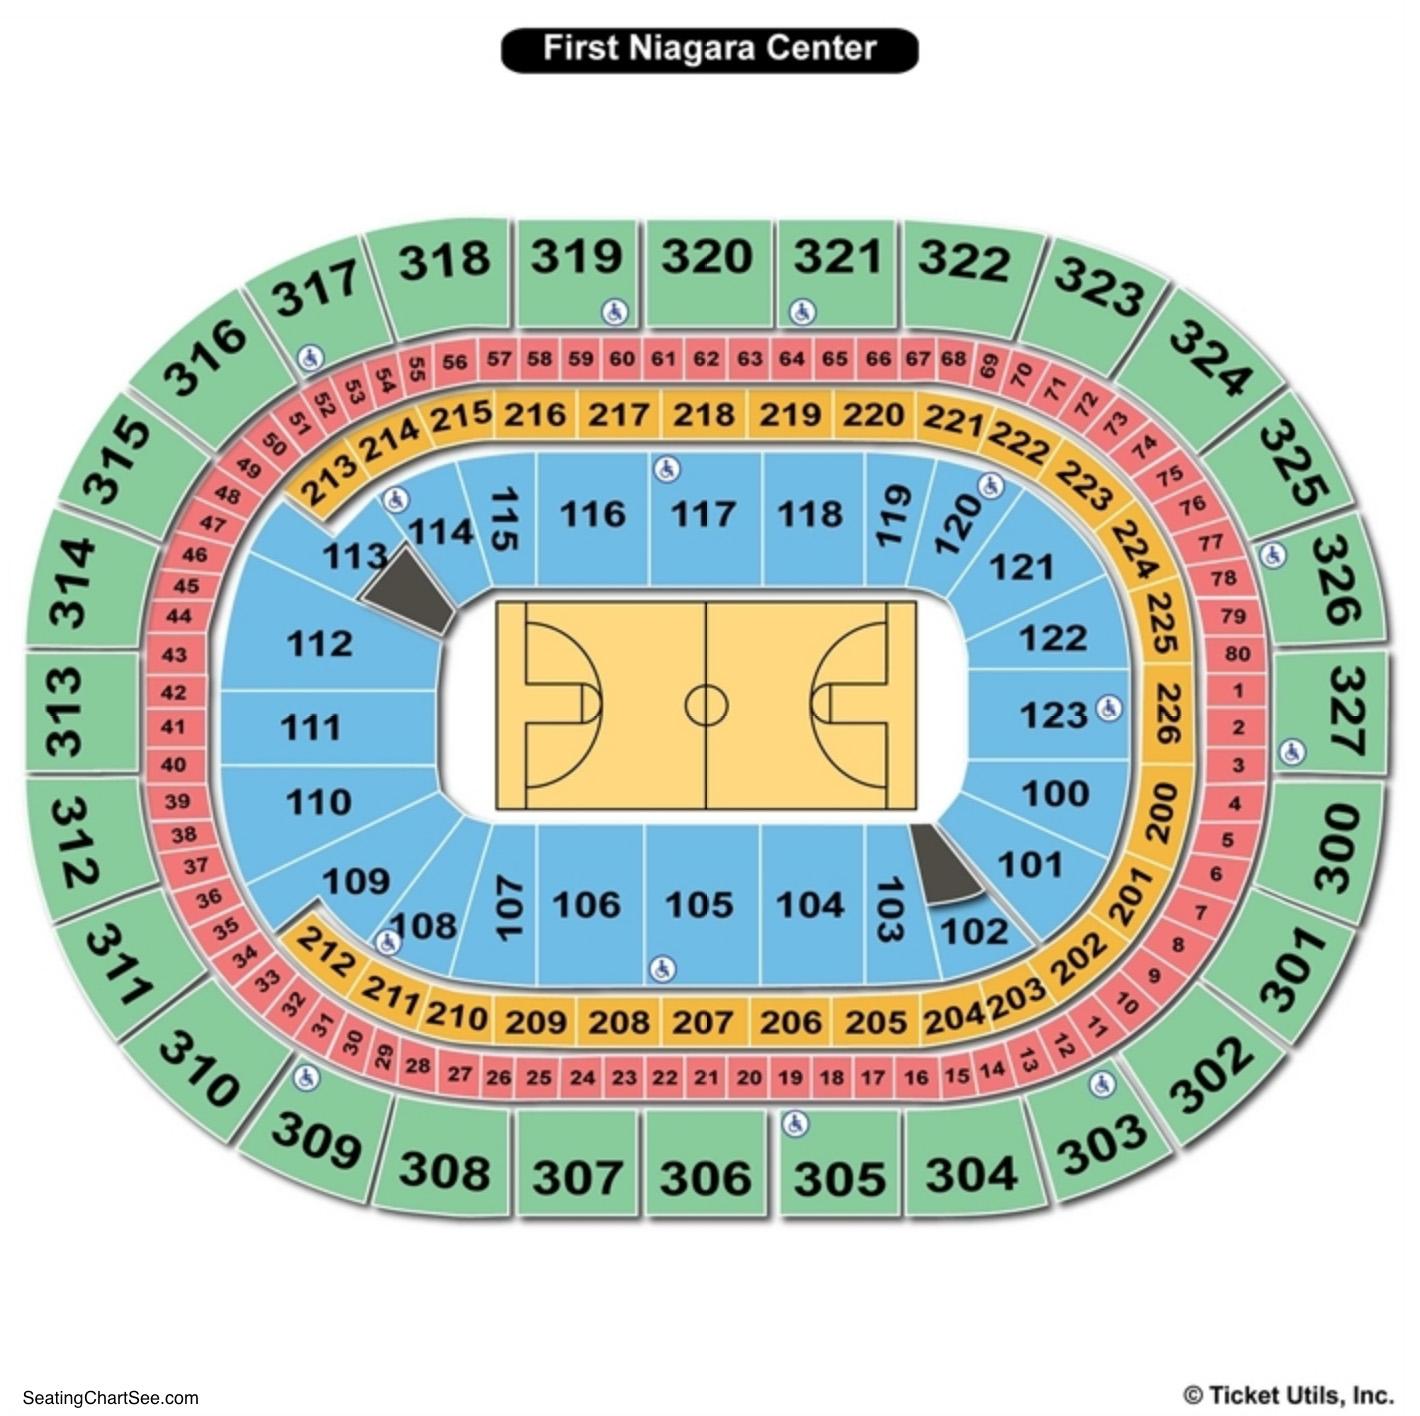 KeyBank Center Basketball Seating Chart